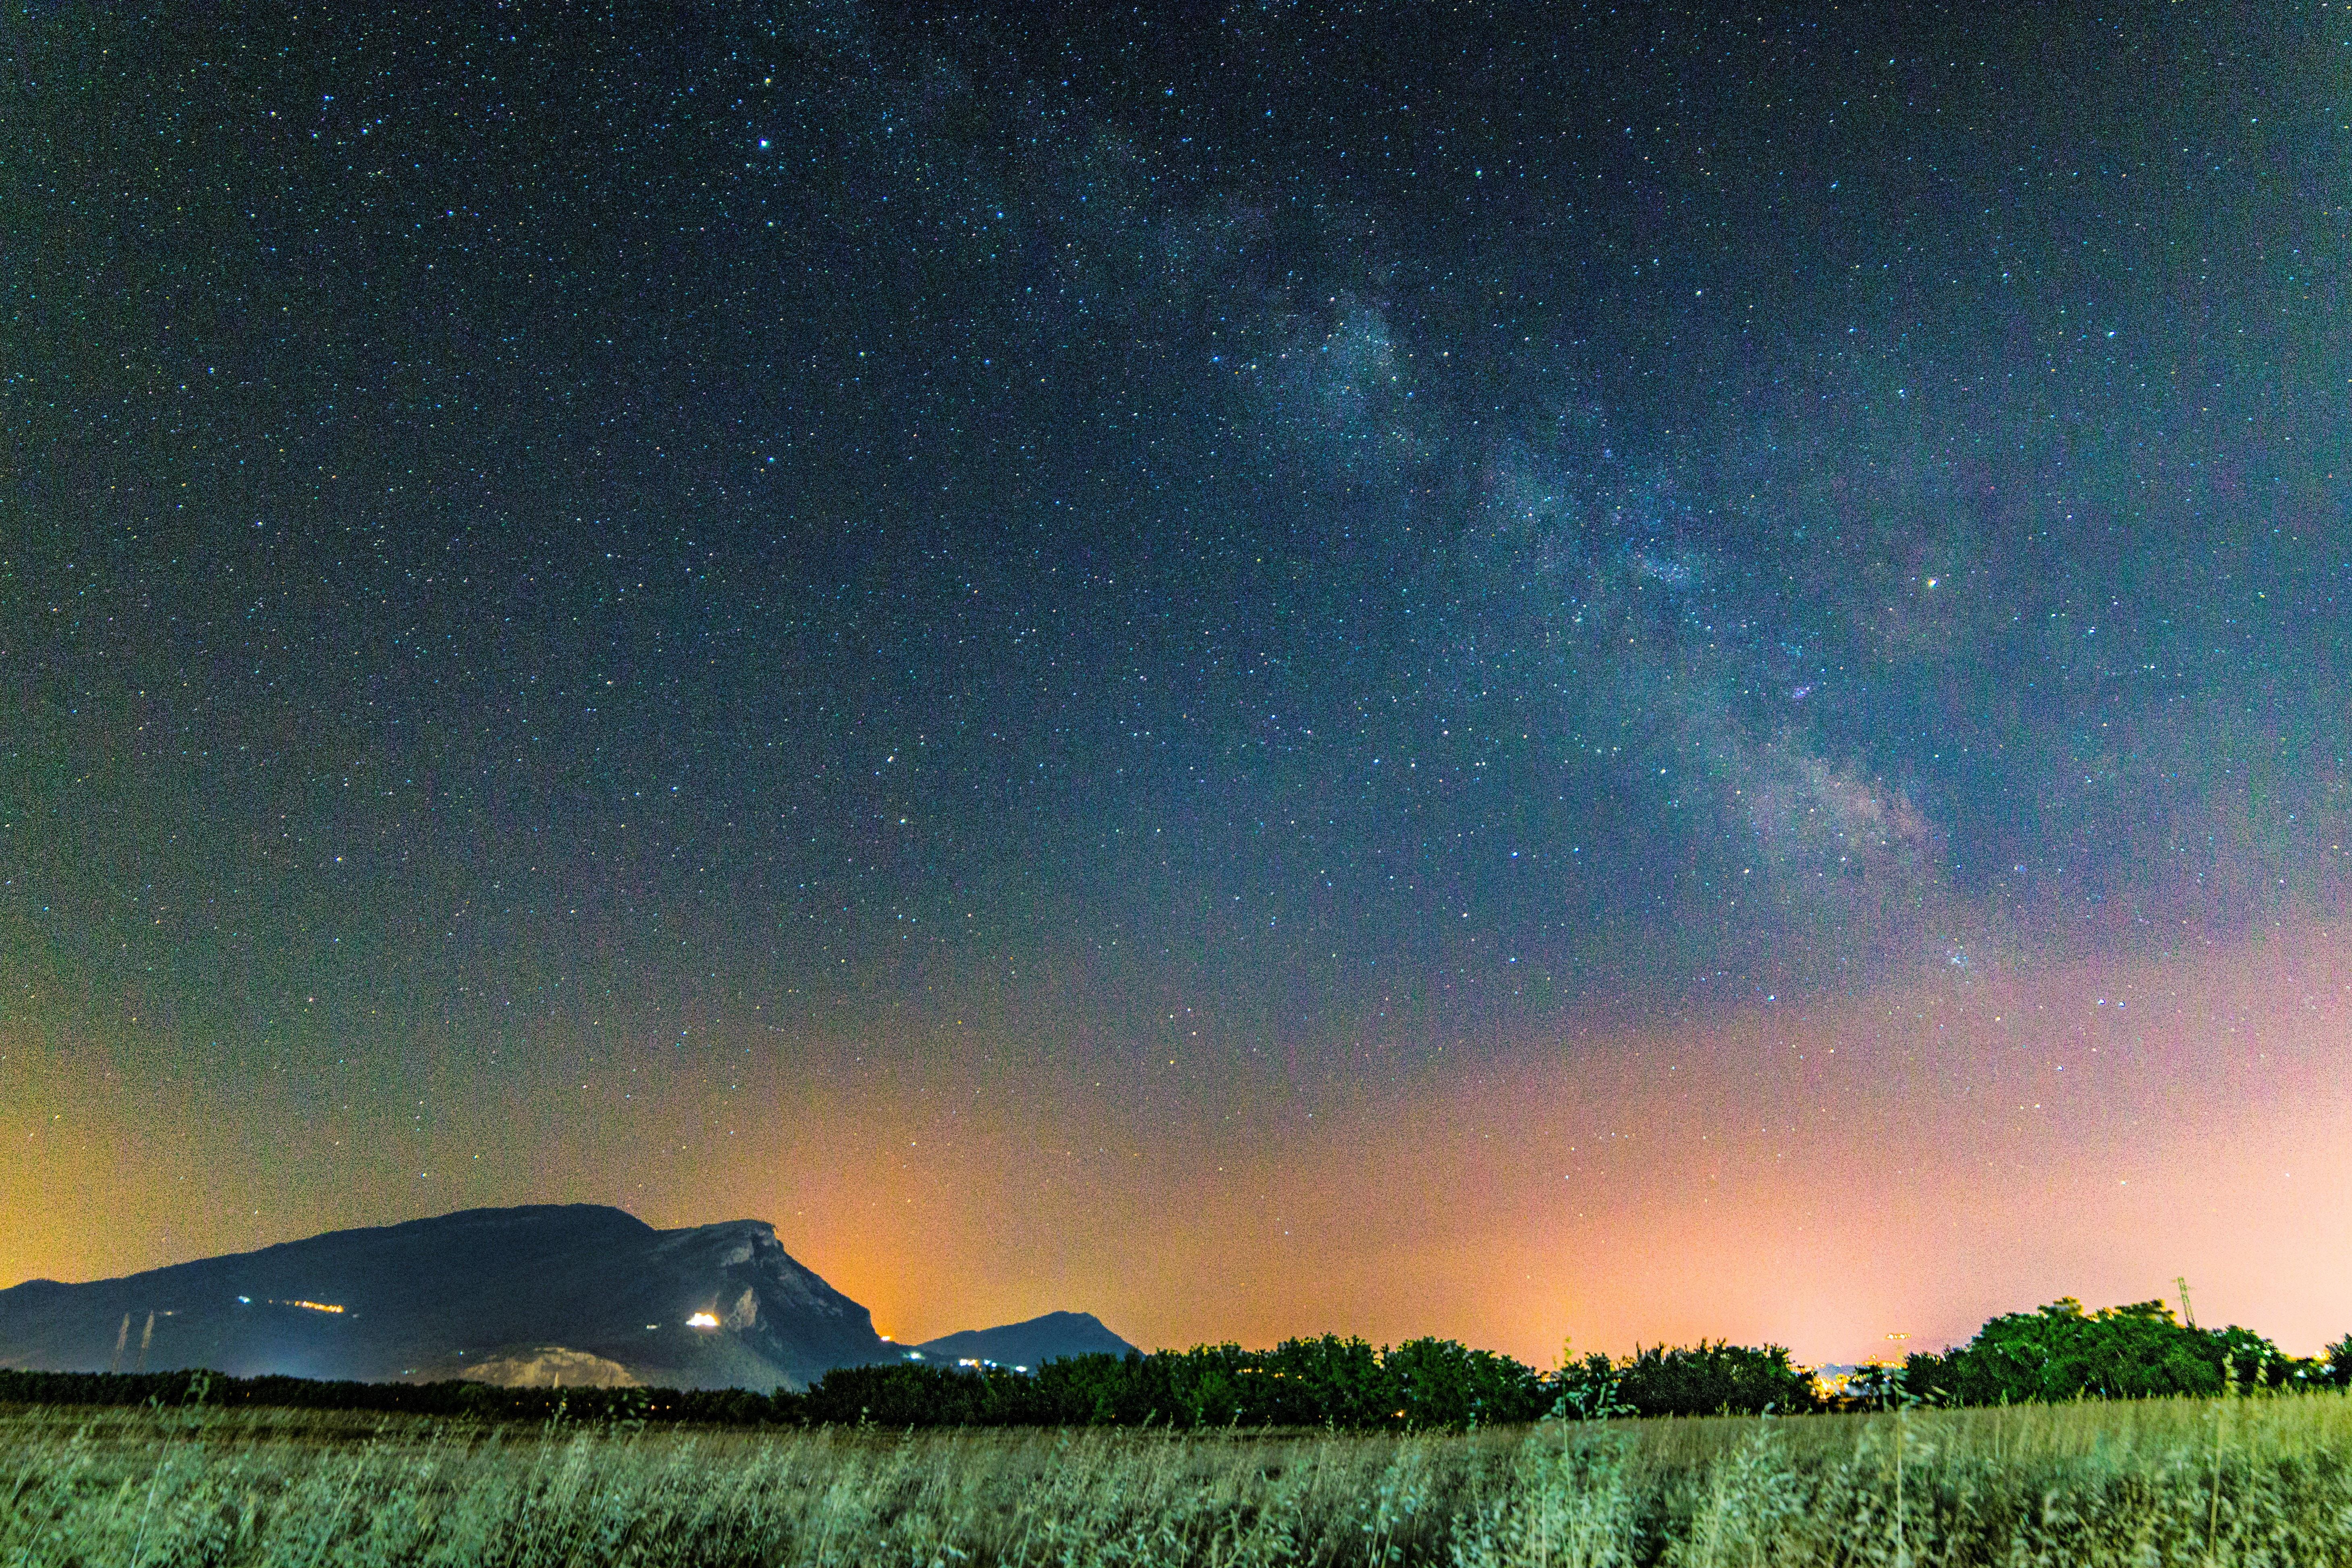 grass field under starry sky